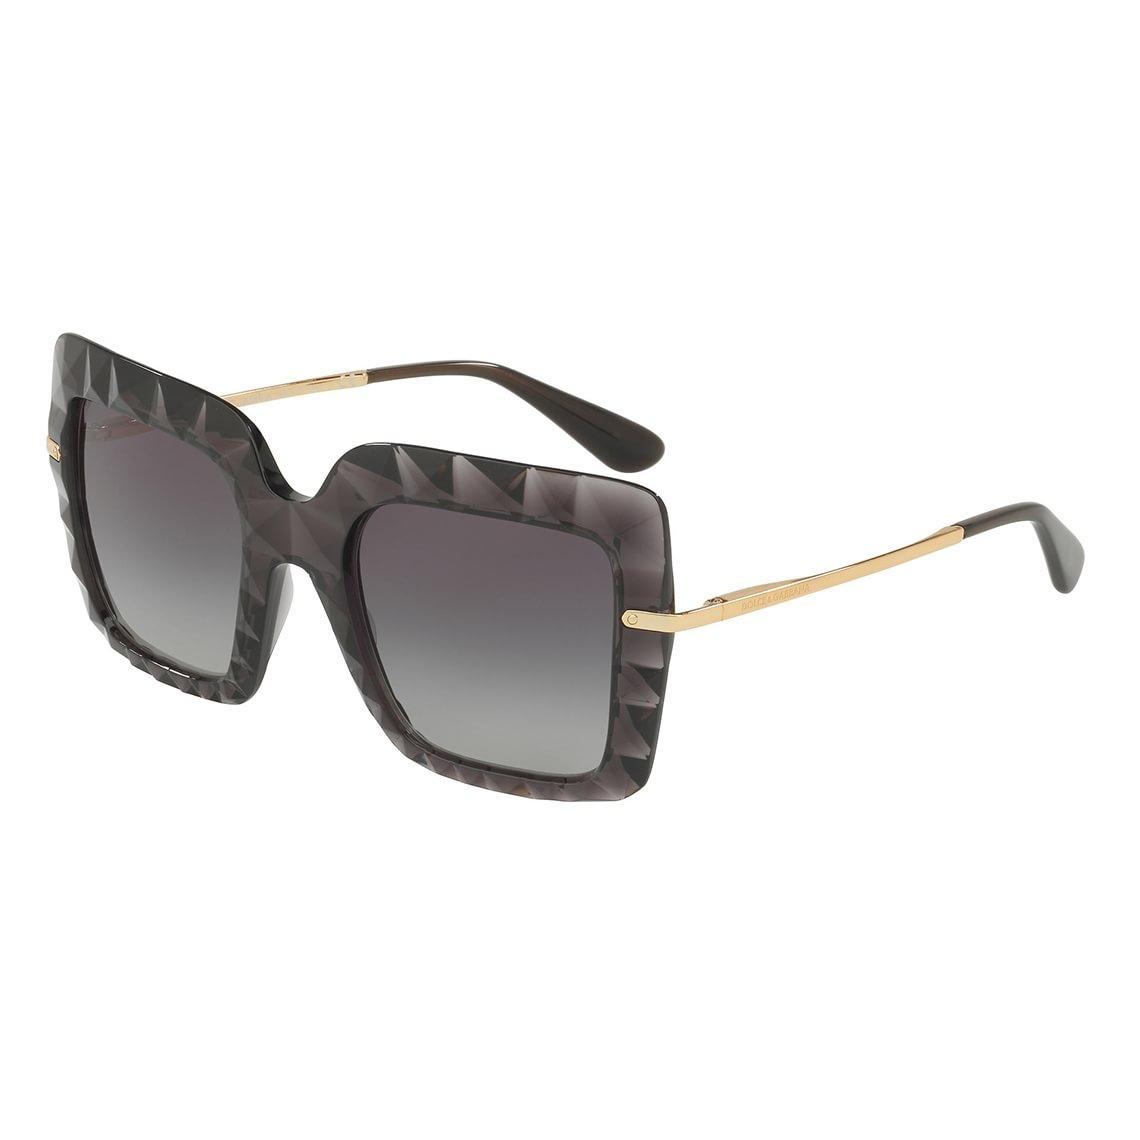 Dolce & Gabbana 0DG6111 51 504/8G